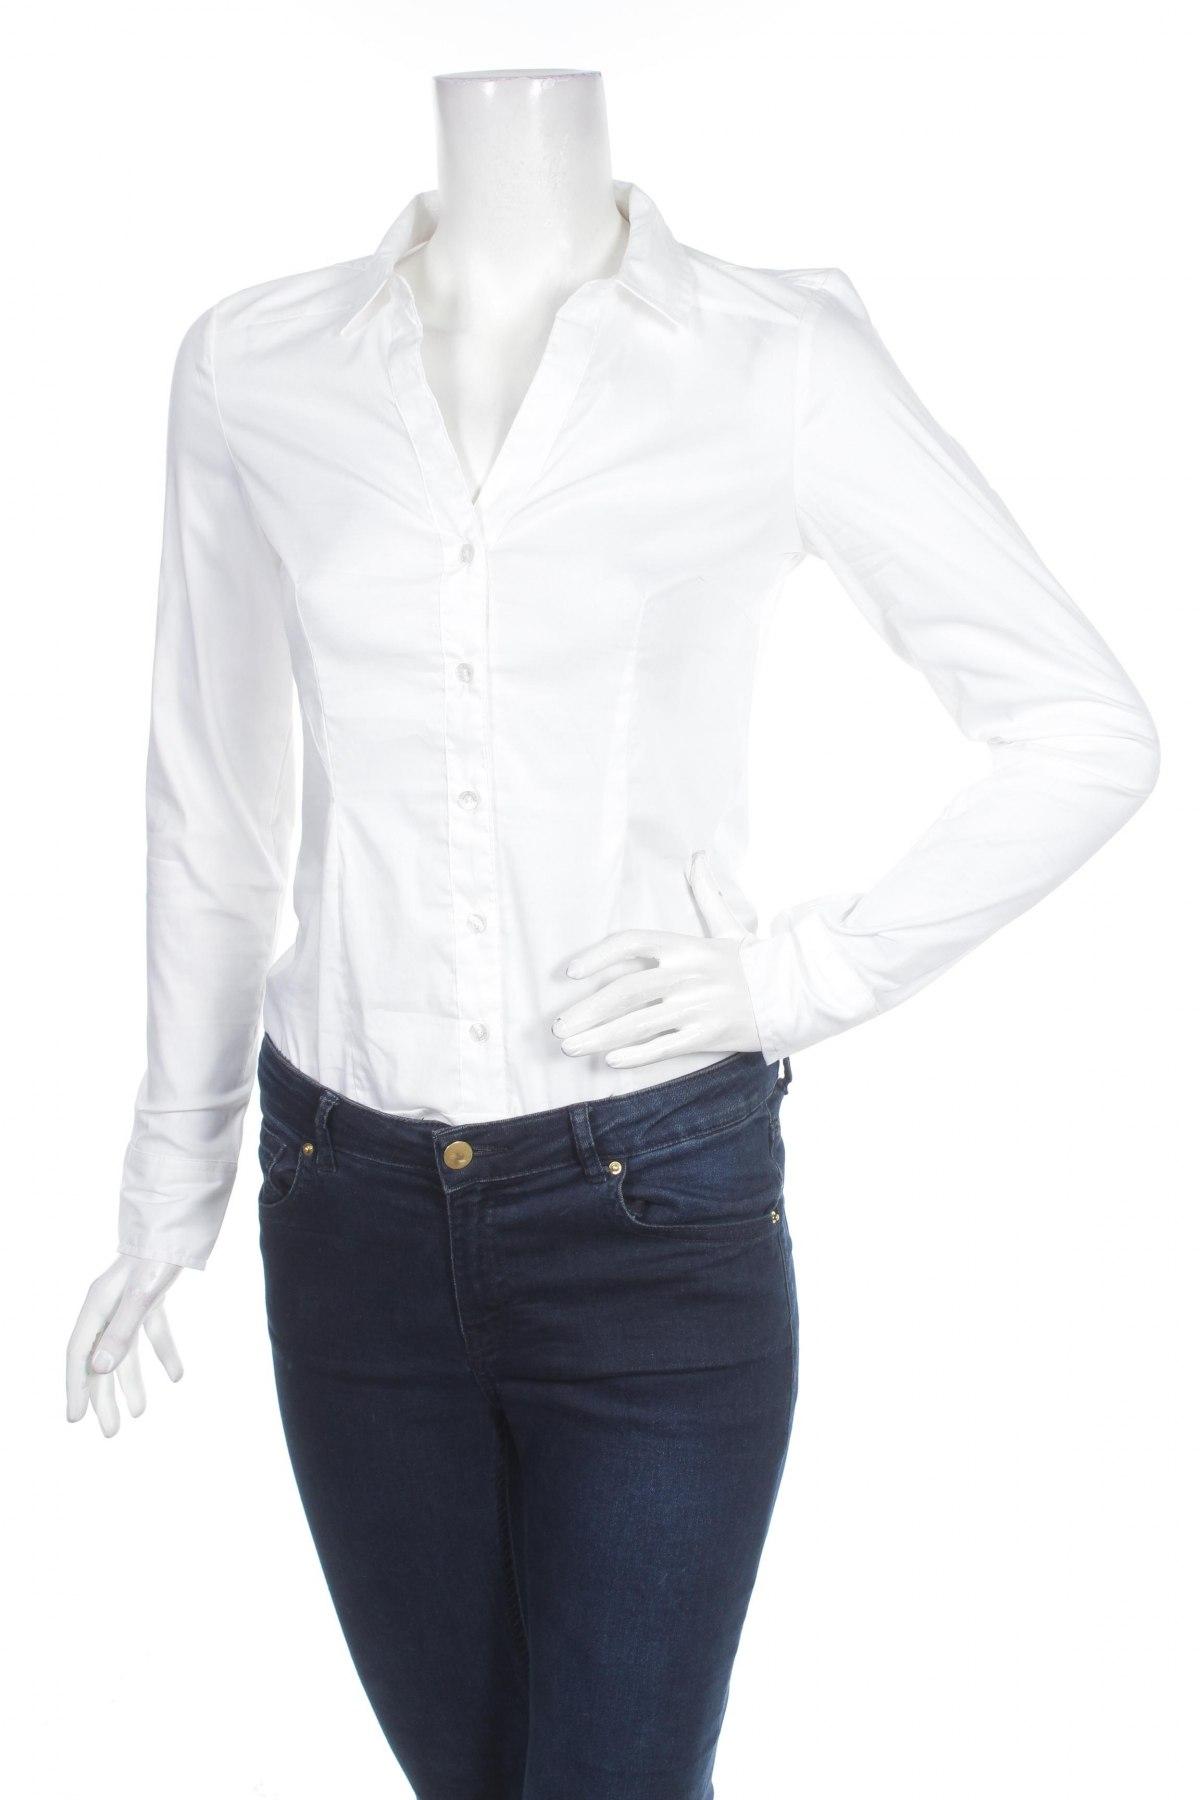 ede4685584c1 Γυναικείο πουκάμισο-κορμάκι Vero Moda - σε συμφέρουσα τιμή στο Remix ...